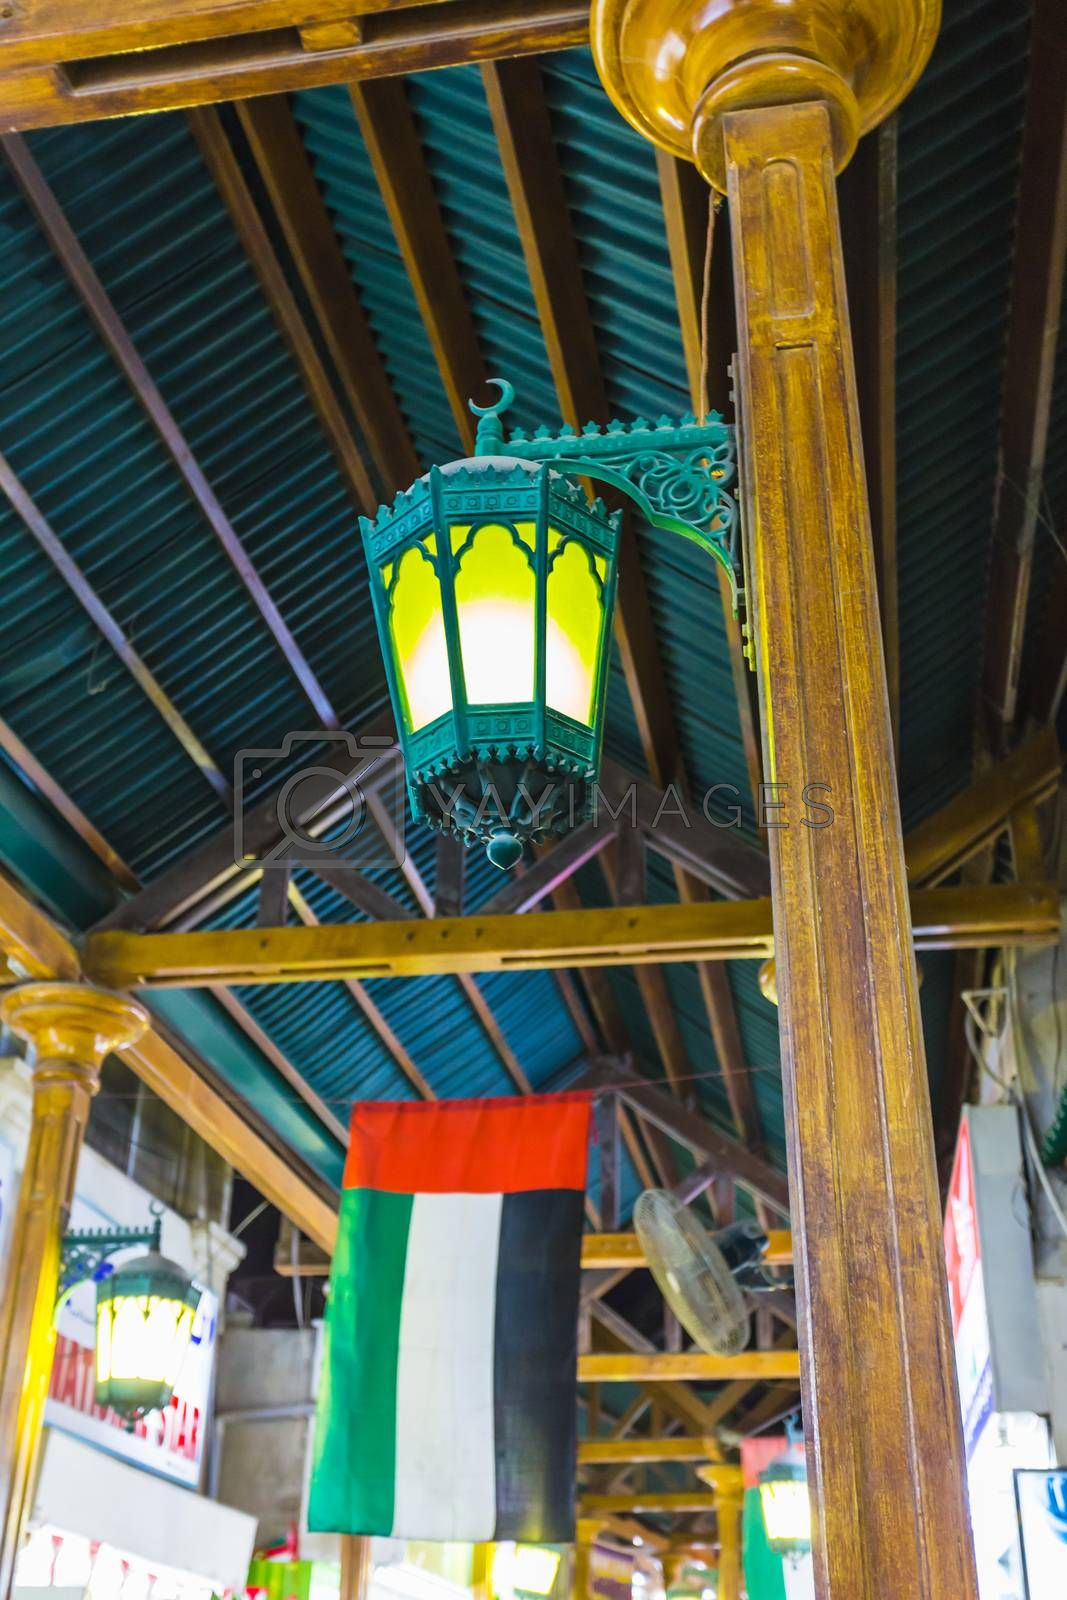 Royalty free image of Arab street lanterns in the city of Dubai by oleg_zhukov